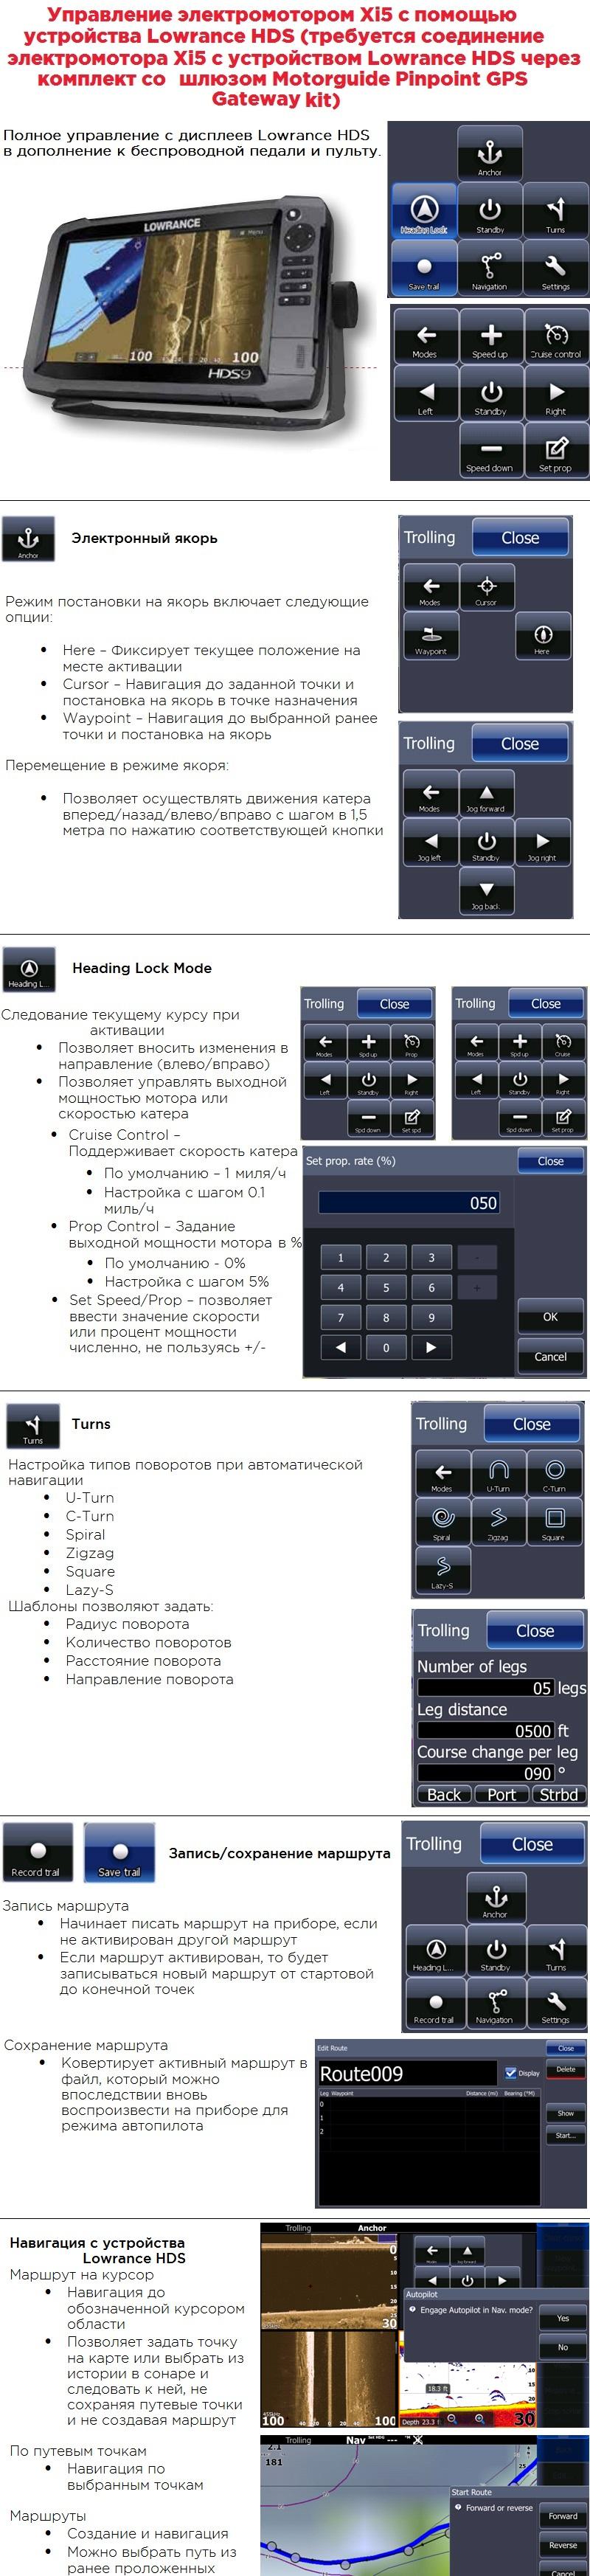 http://www.mercury-lakor.com/system/images/uploads/232-original-04.jpg?1478781201